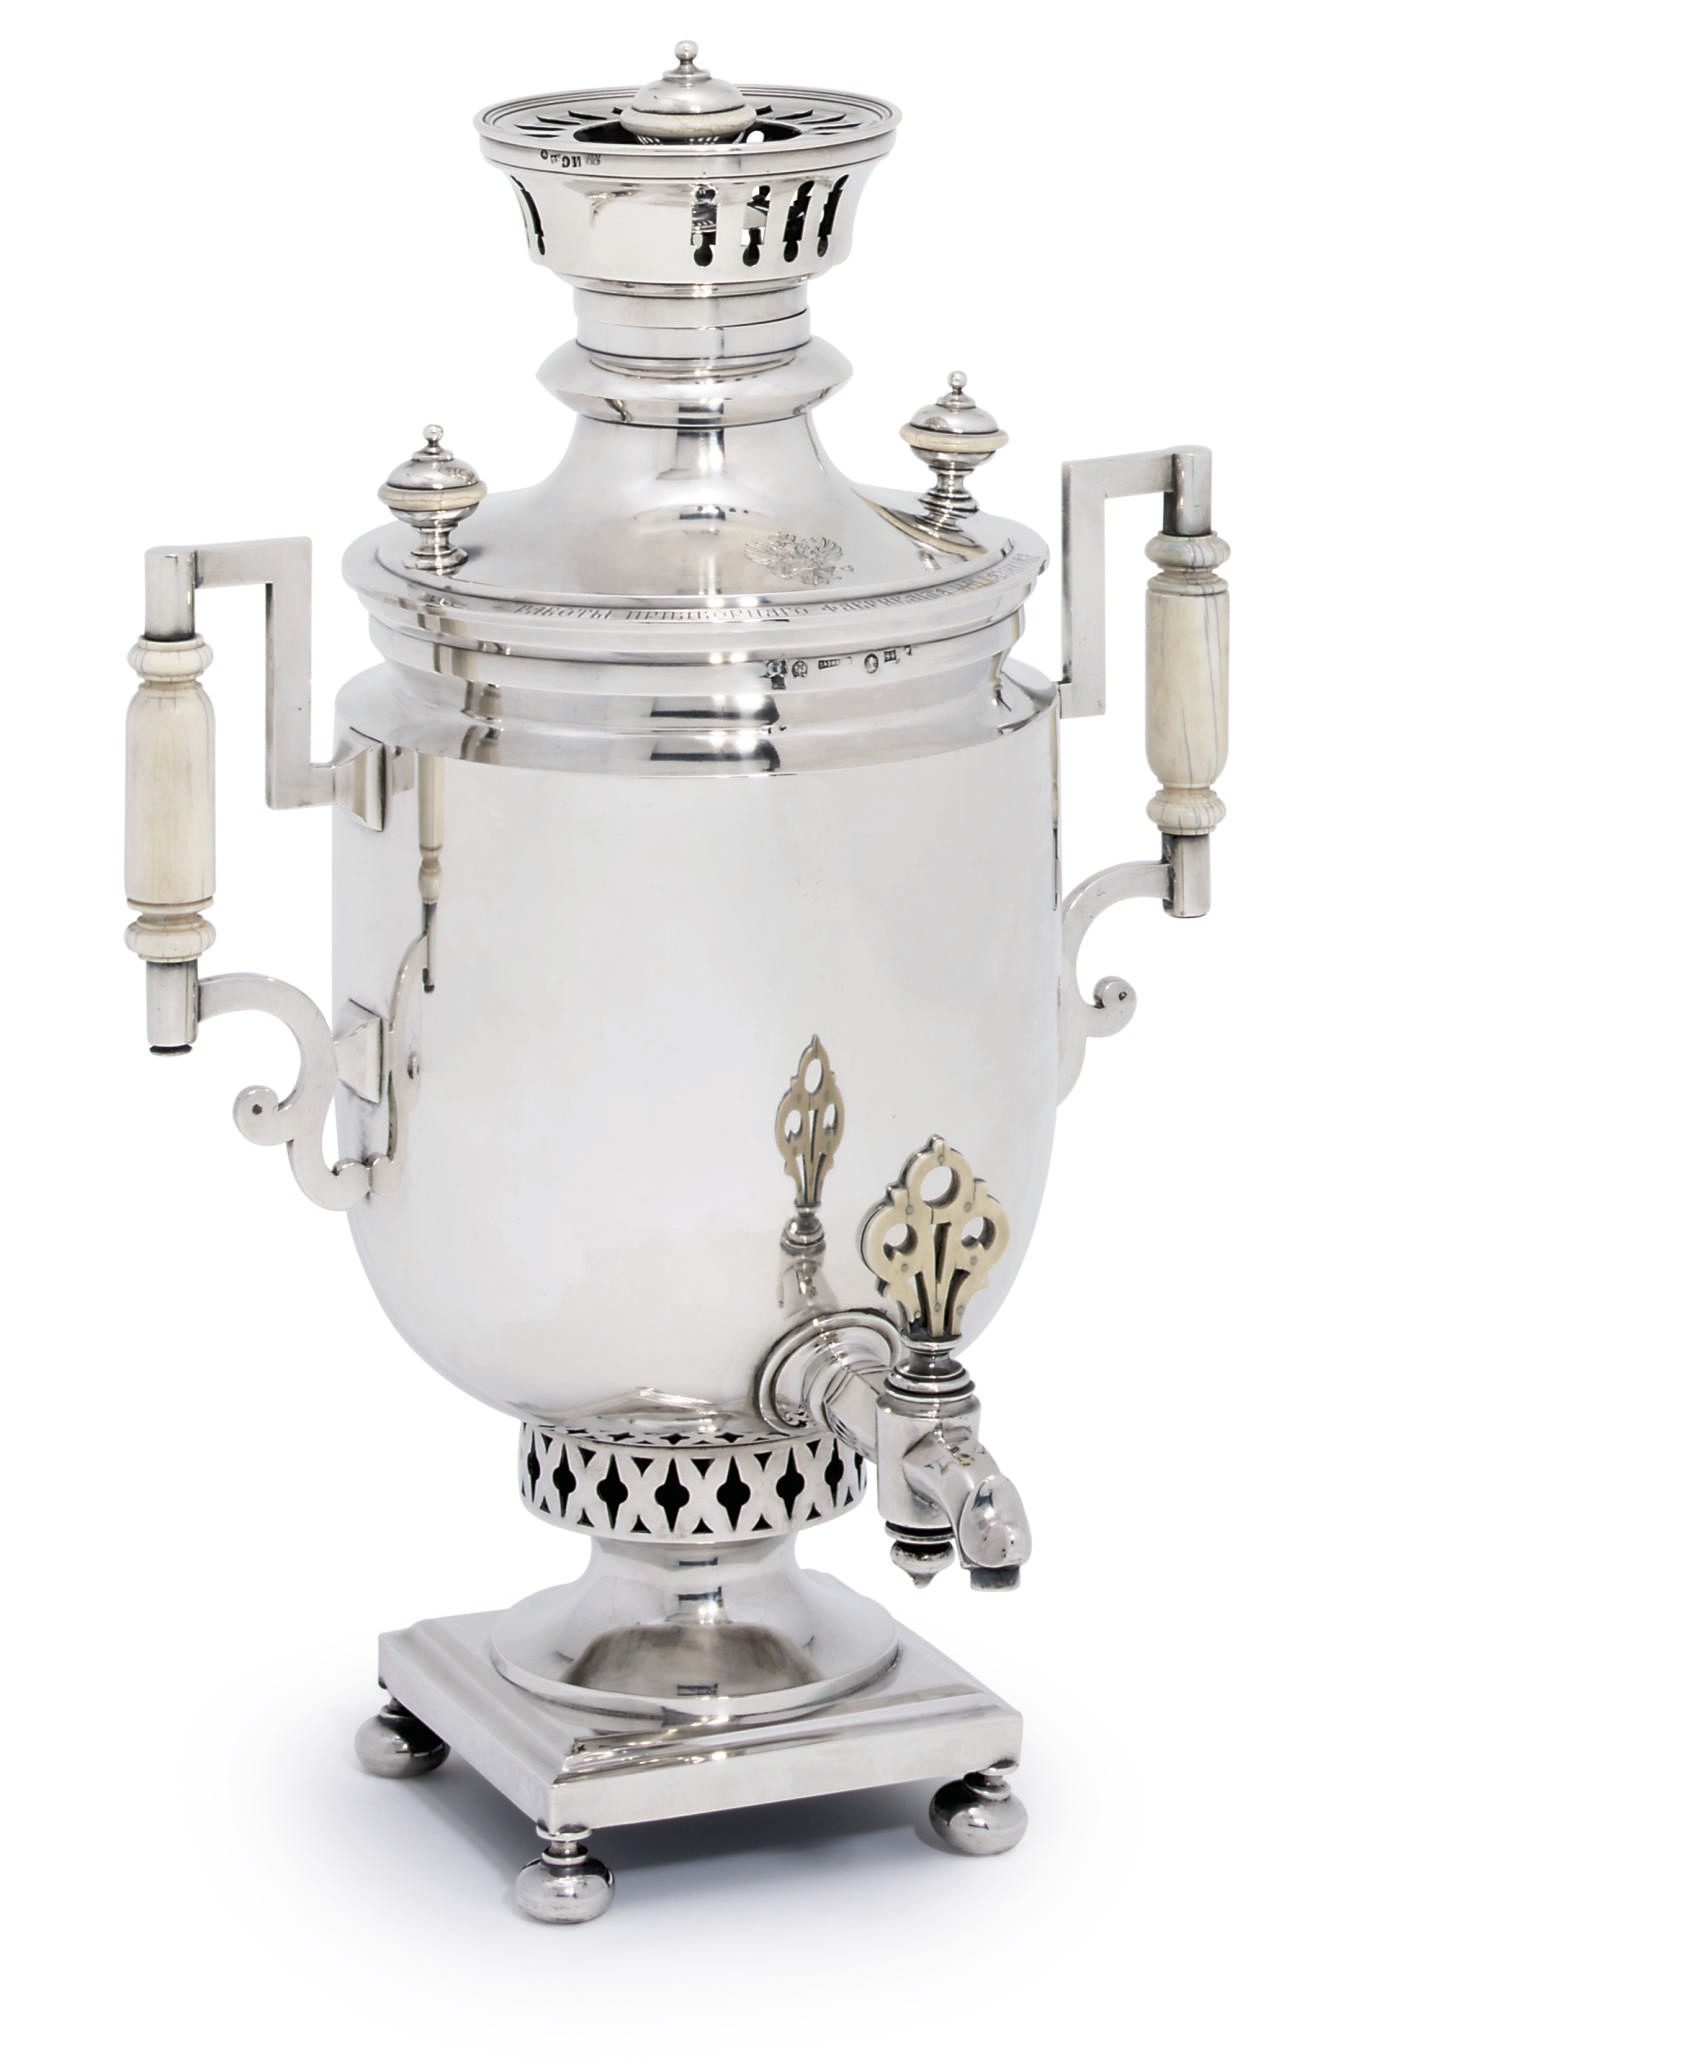 A silver samovar